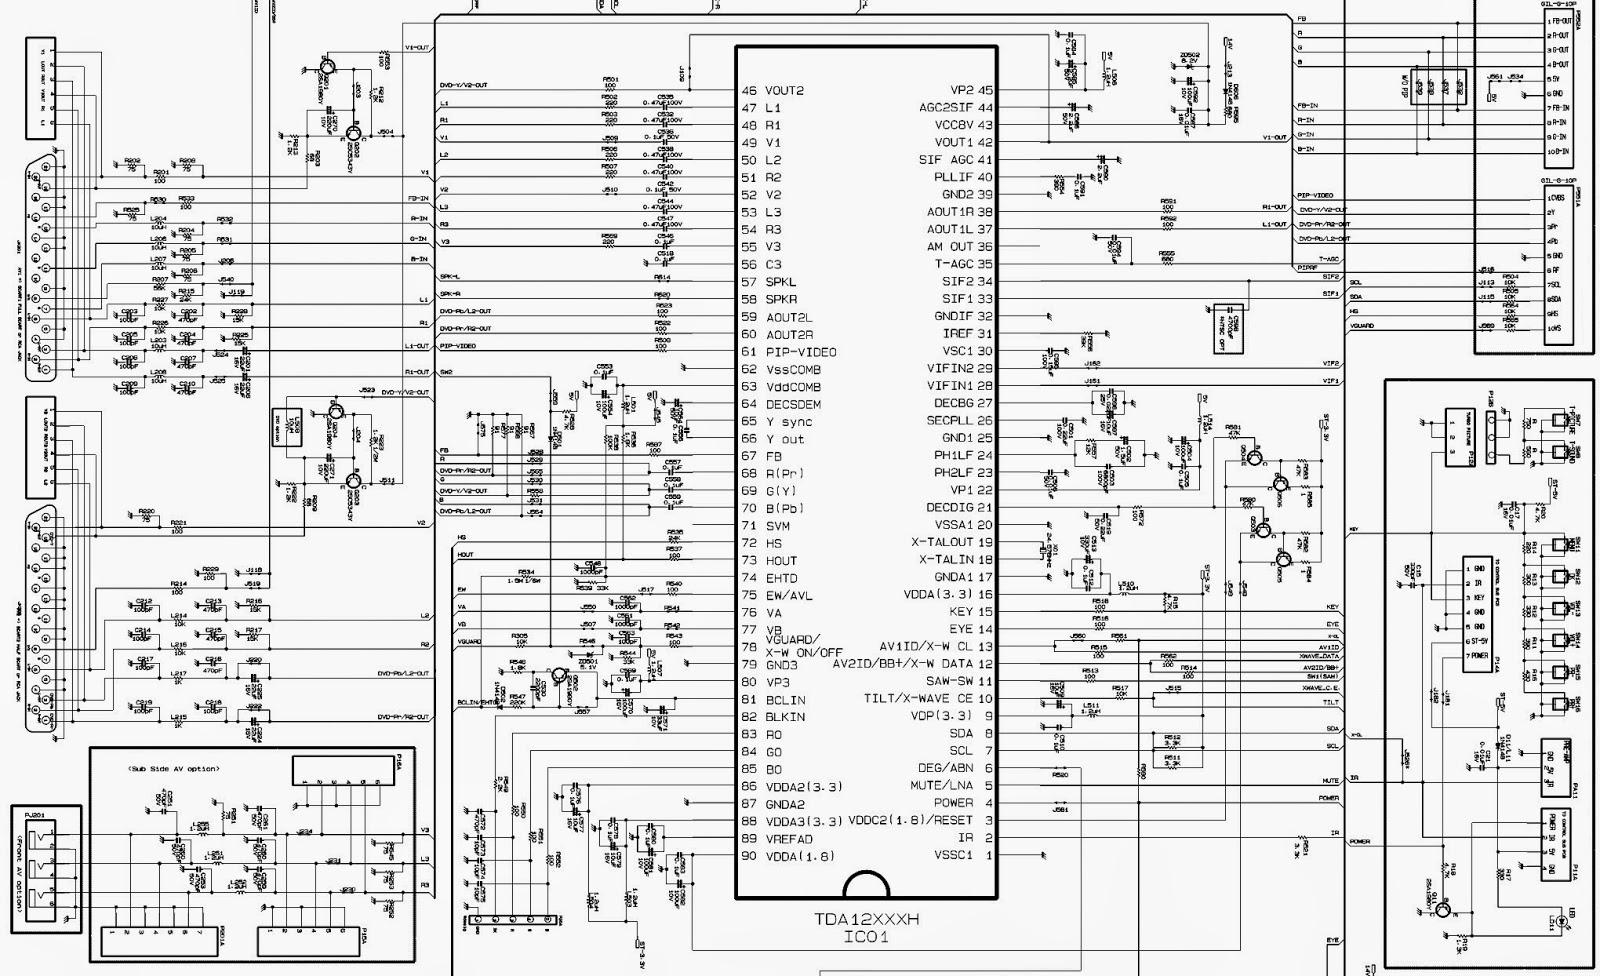 Tv Tuner Card Circuit Diagram Flat Four Wiring  The